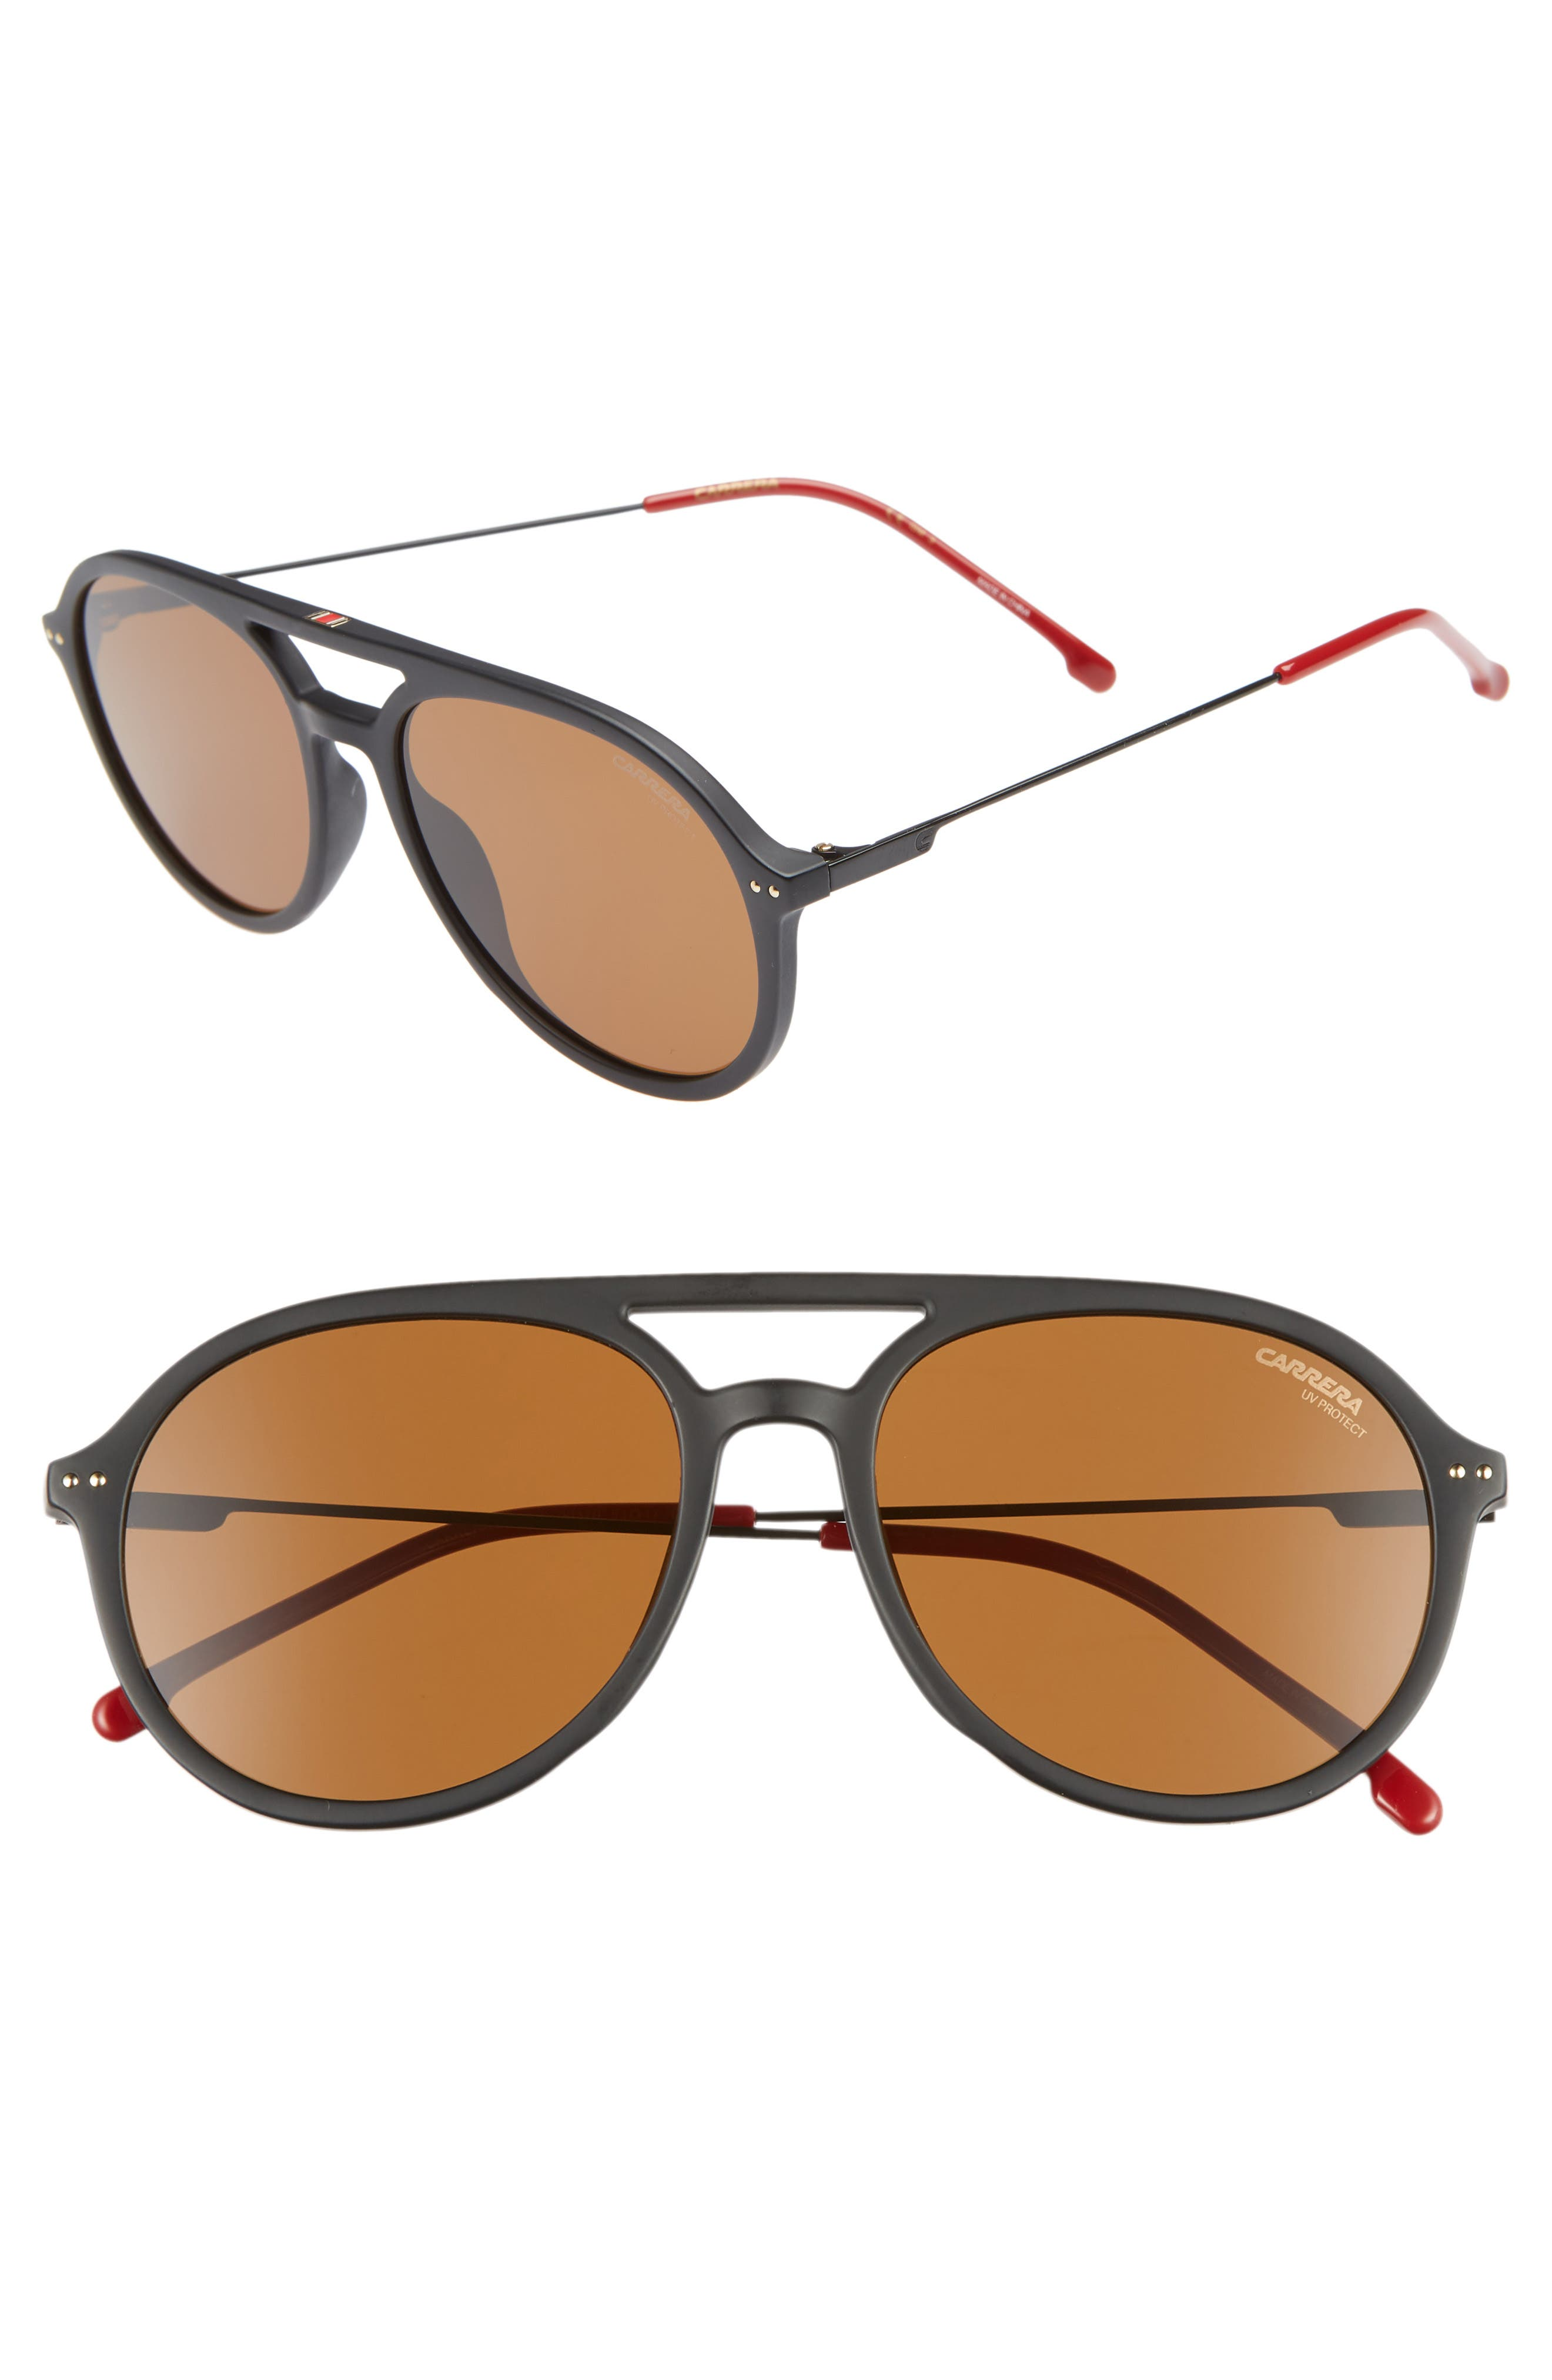 5dc976653b Carrera Eyewear 5m Aviator Sunglasses - Matte Black